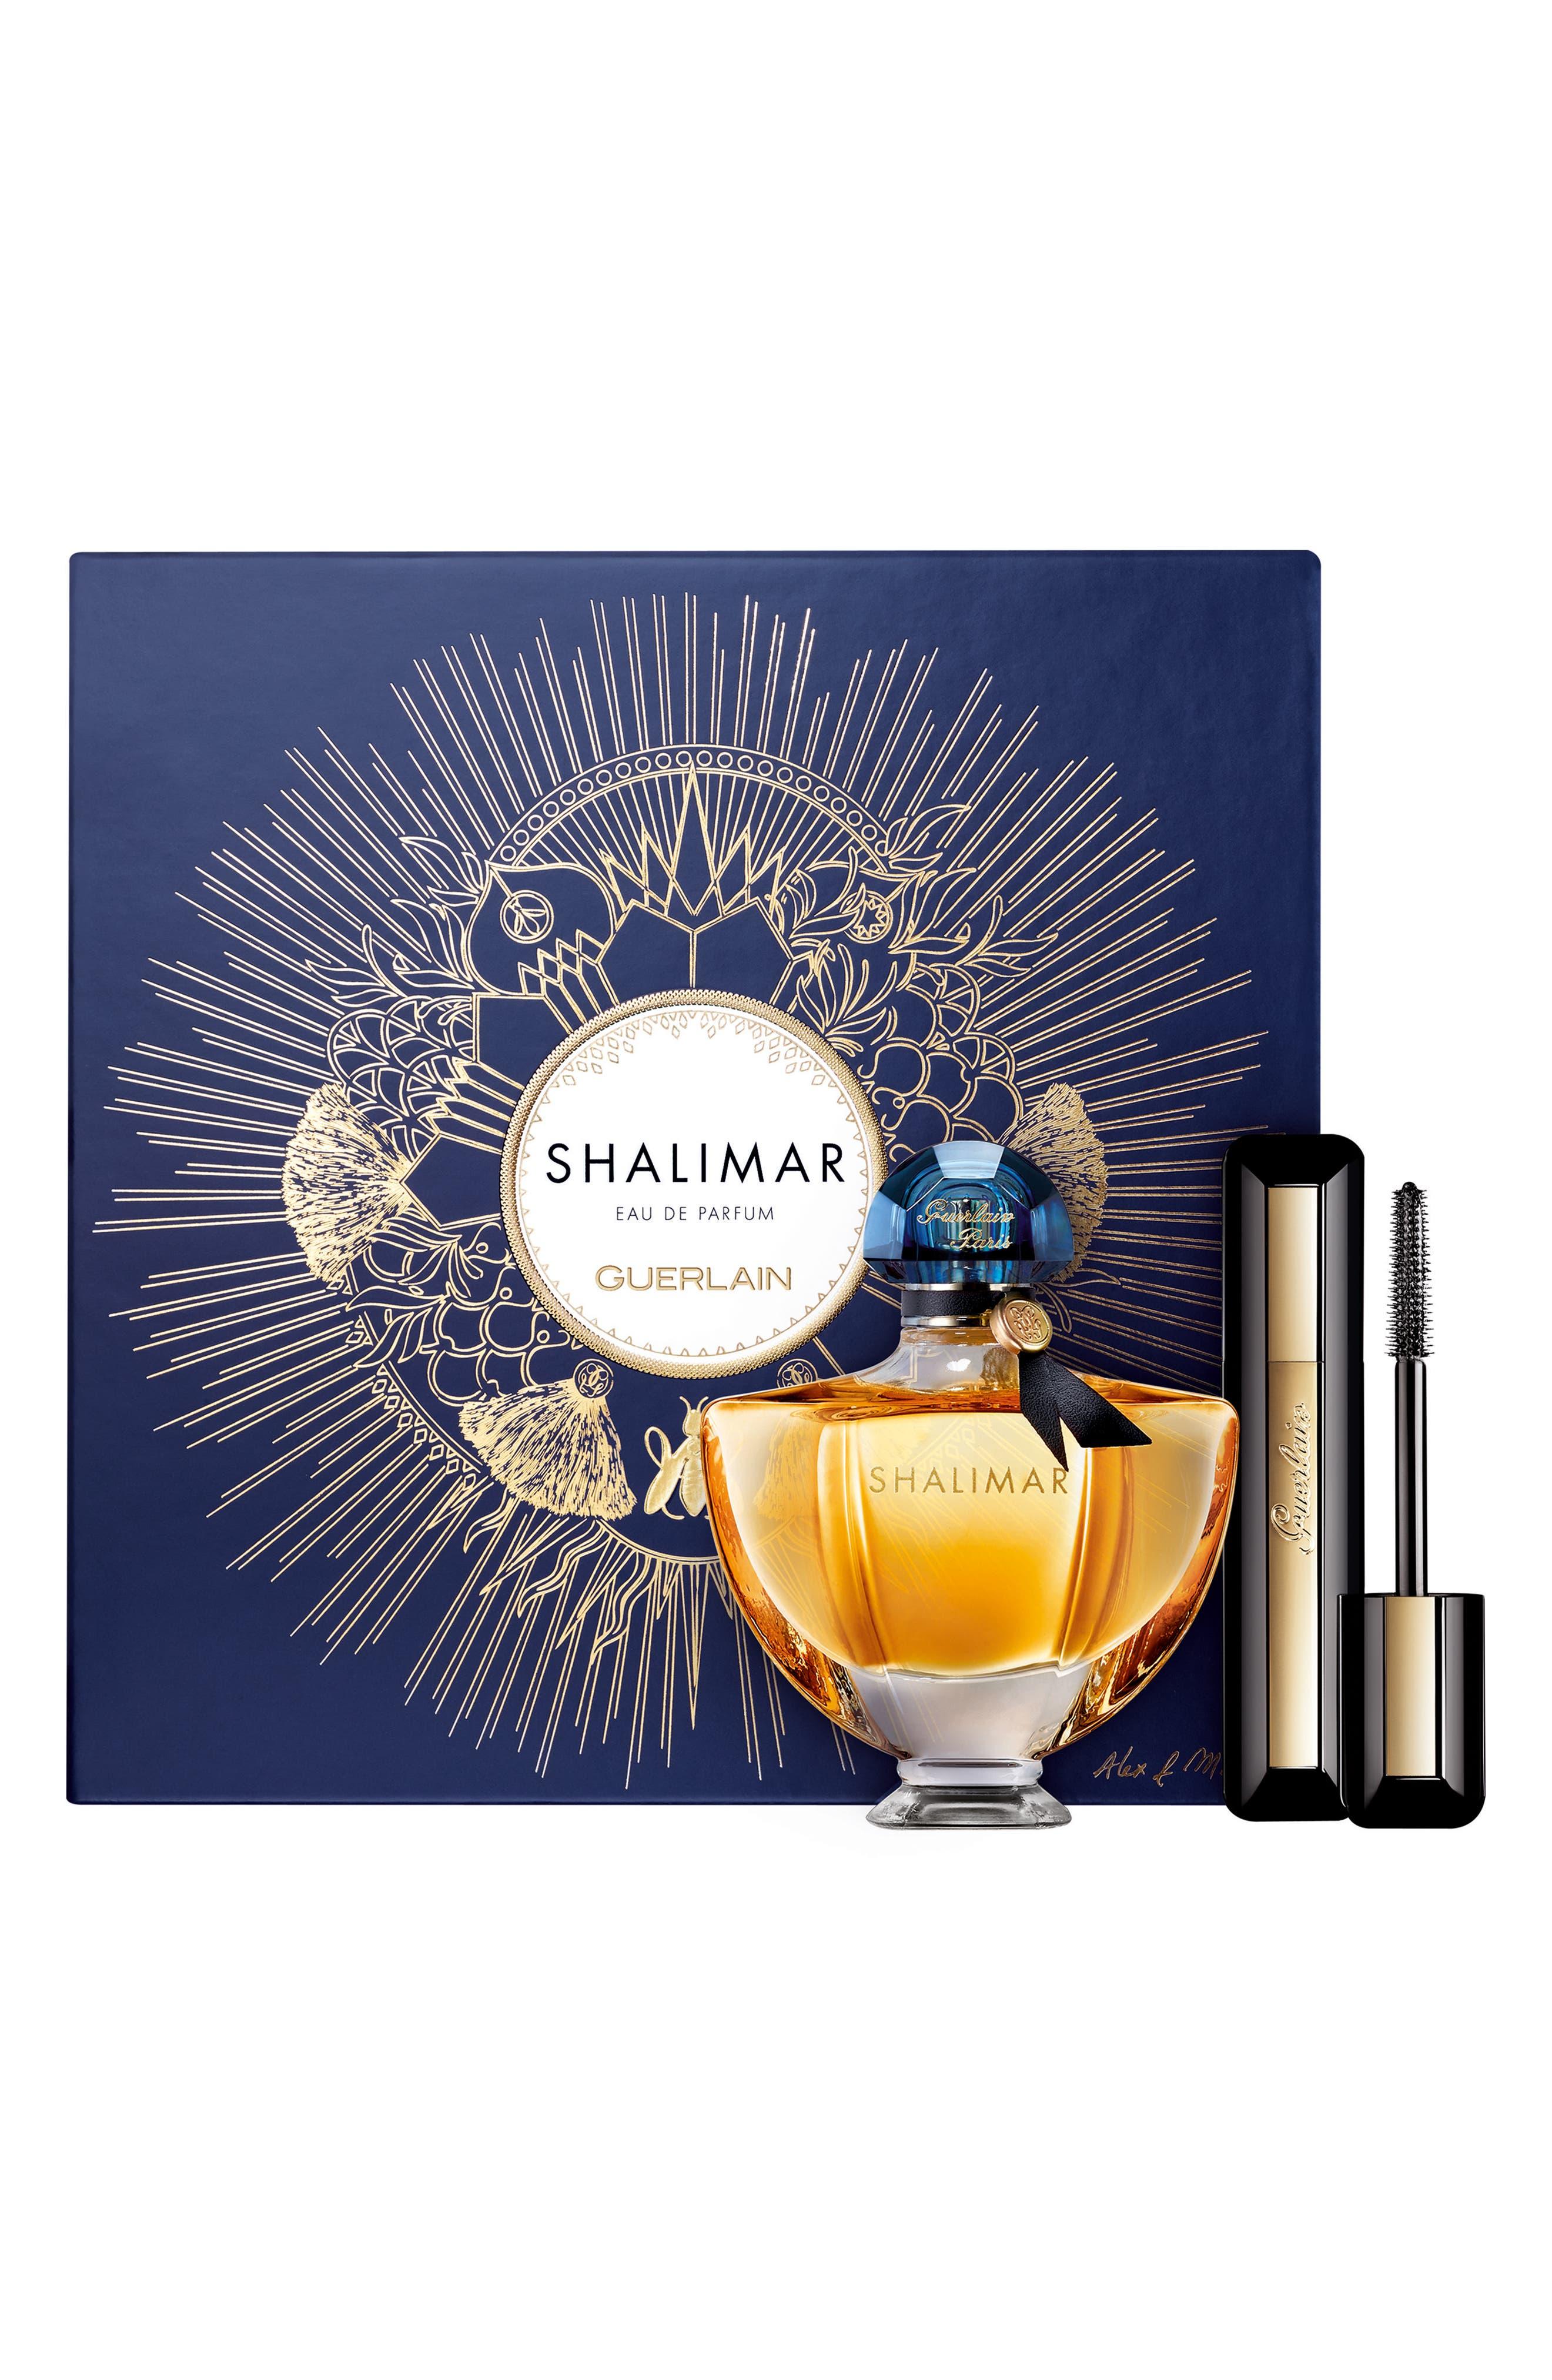 Alex & Marine Shalimar Eau de Parfum & Mascara Set,                         Main,                         color, No Color